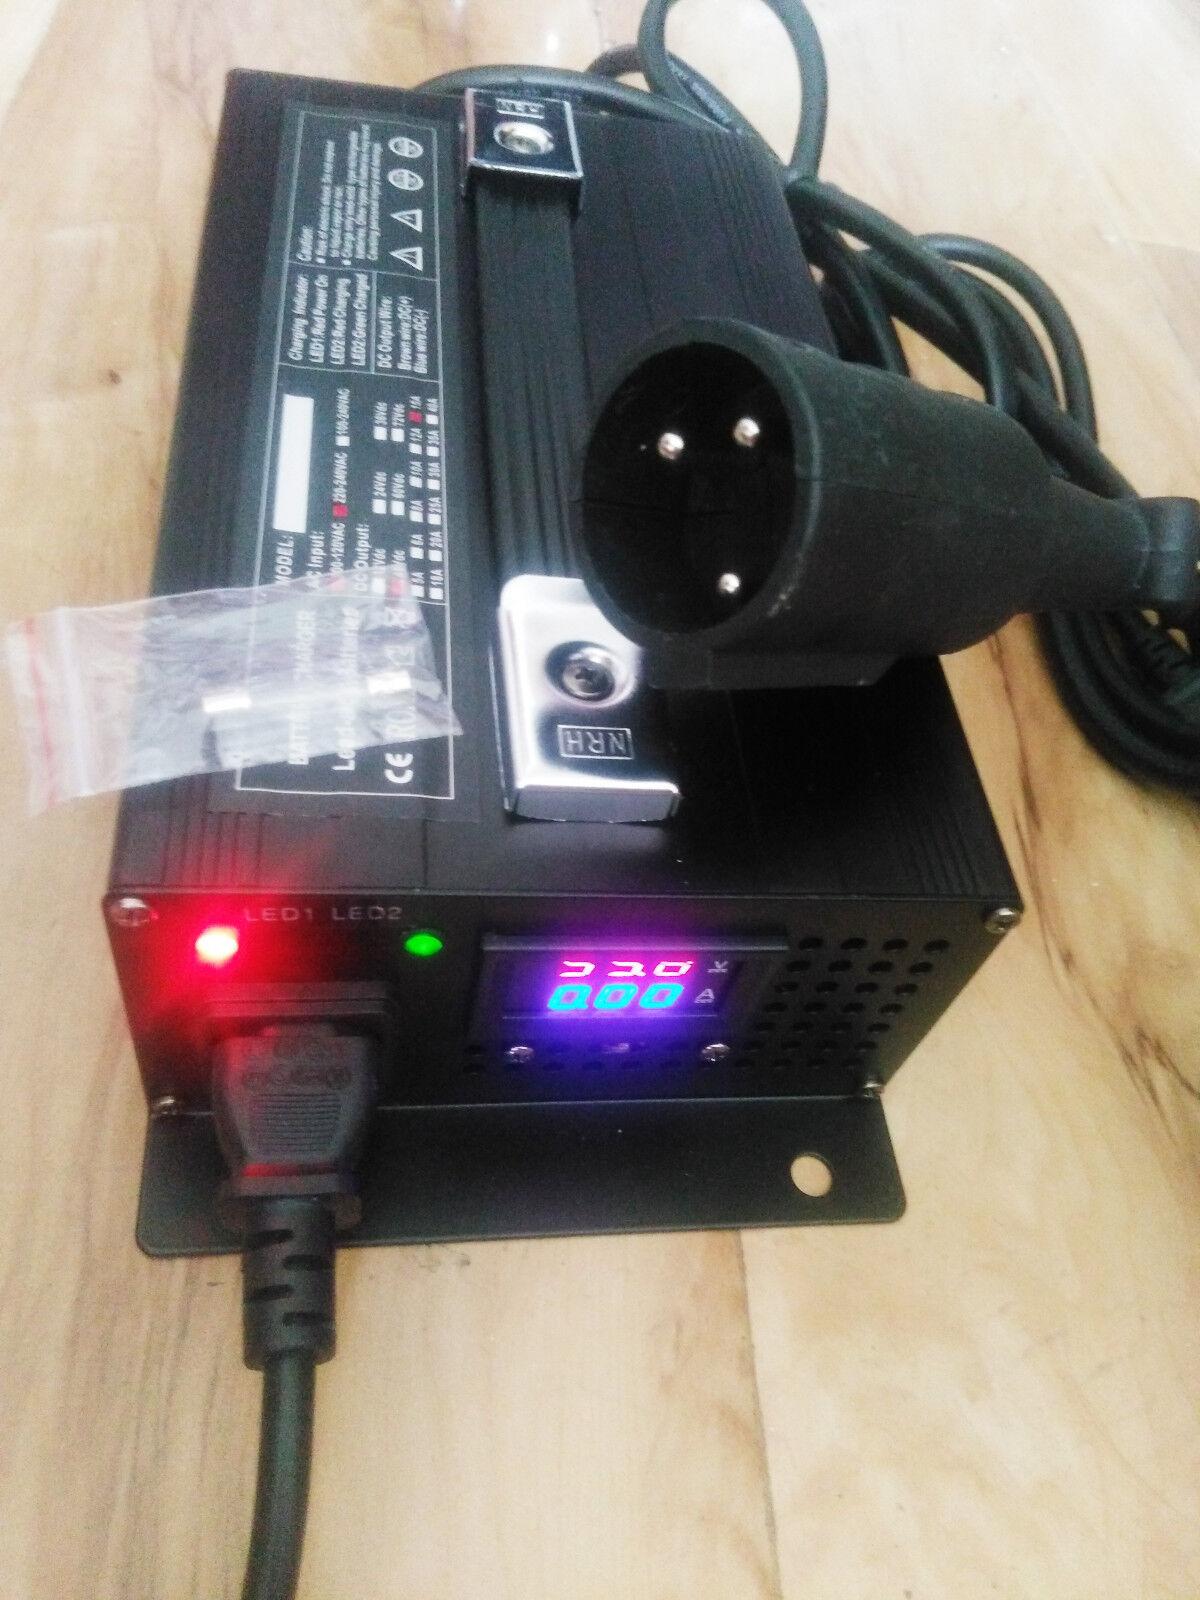 48v Club Car Golf Cart Battery Charger Connector 48 Volt 15 Amp Dpi Wiring Diagram Round 3 Pin Plug Ebay